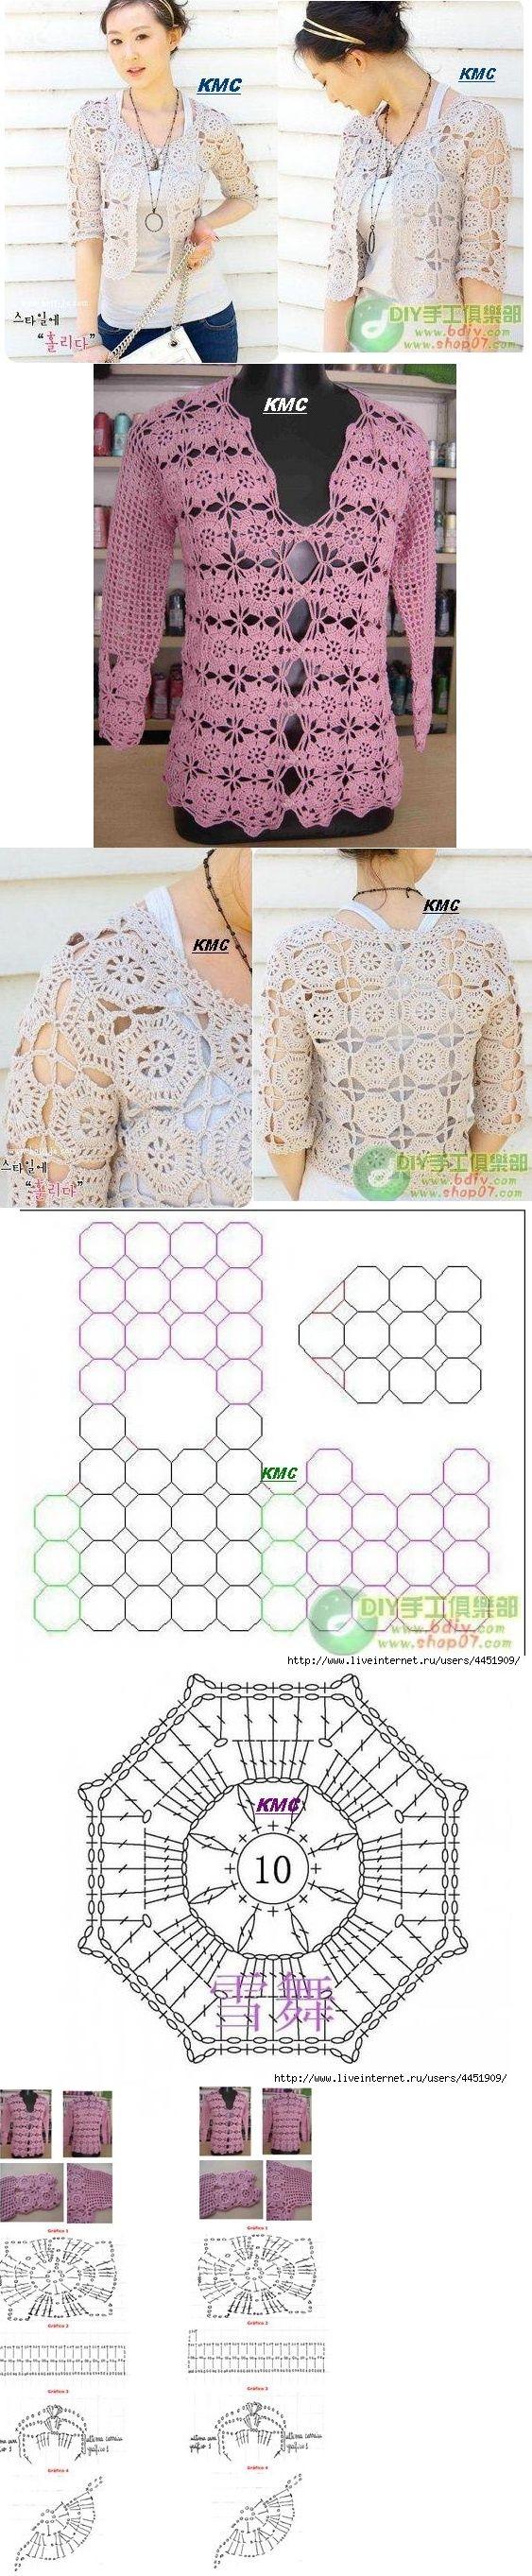 Cristina My Crochet | Crochet Tatting Beading